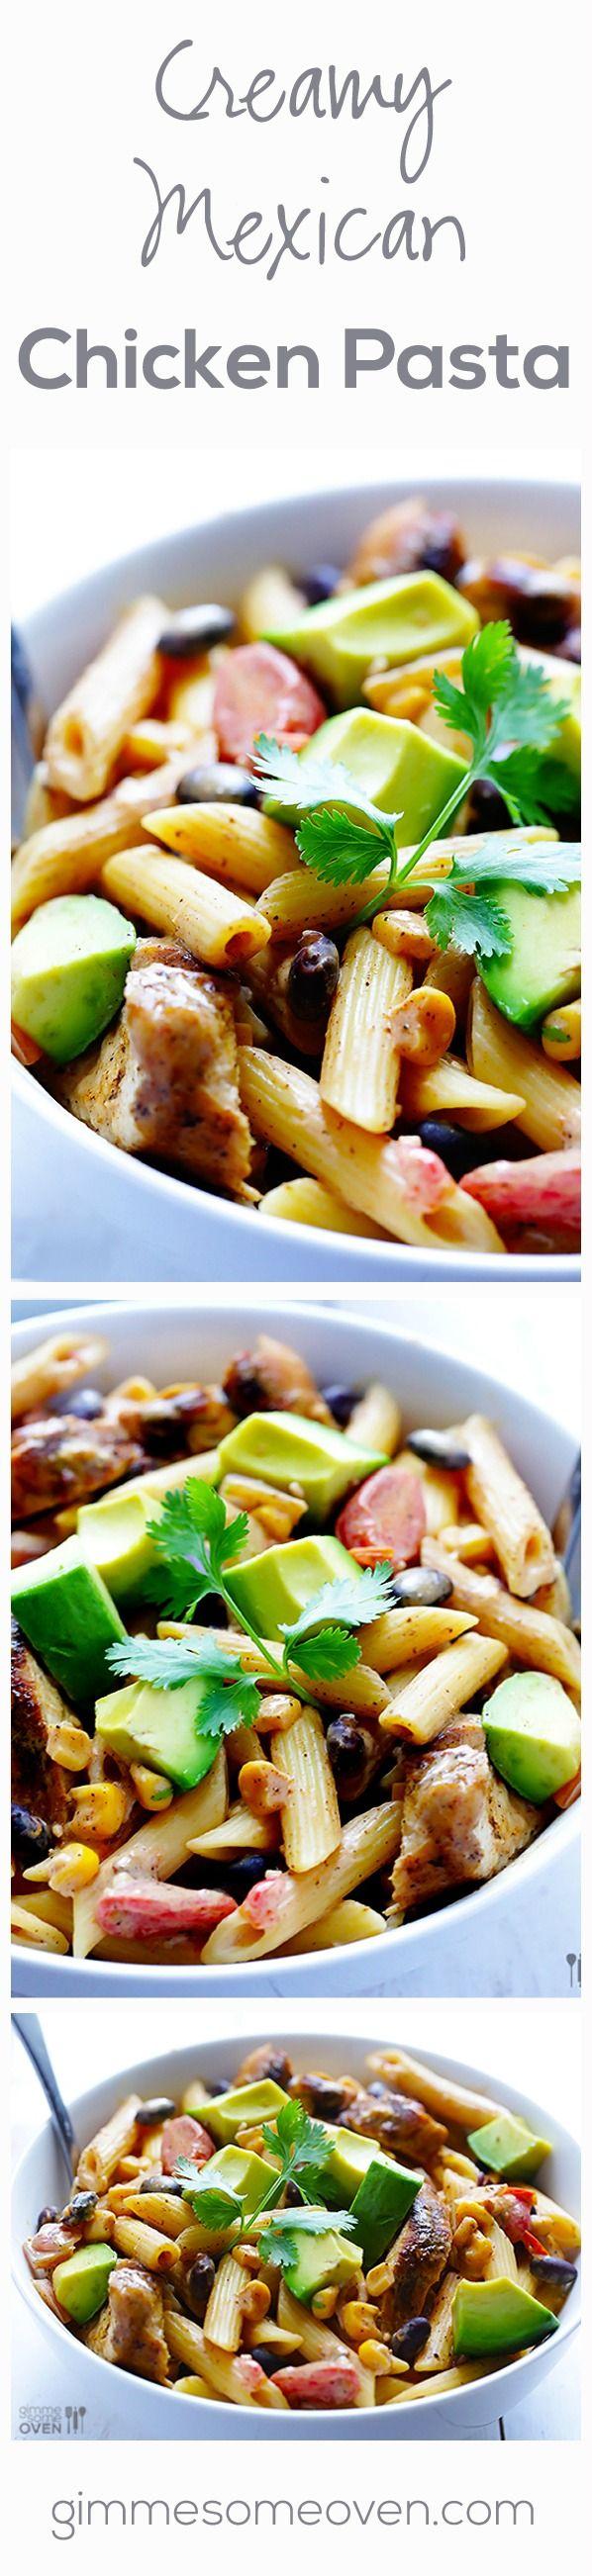 Mexican Chicken Pasta | Recipe | Mexican Chicken, Chicken Pasta and ...